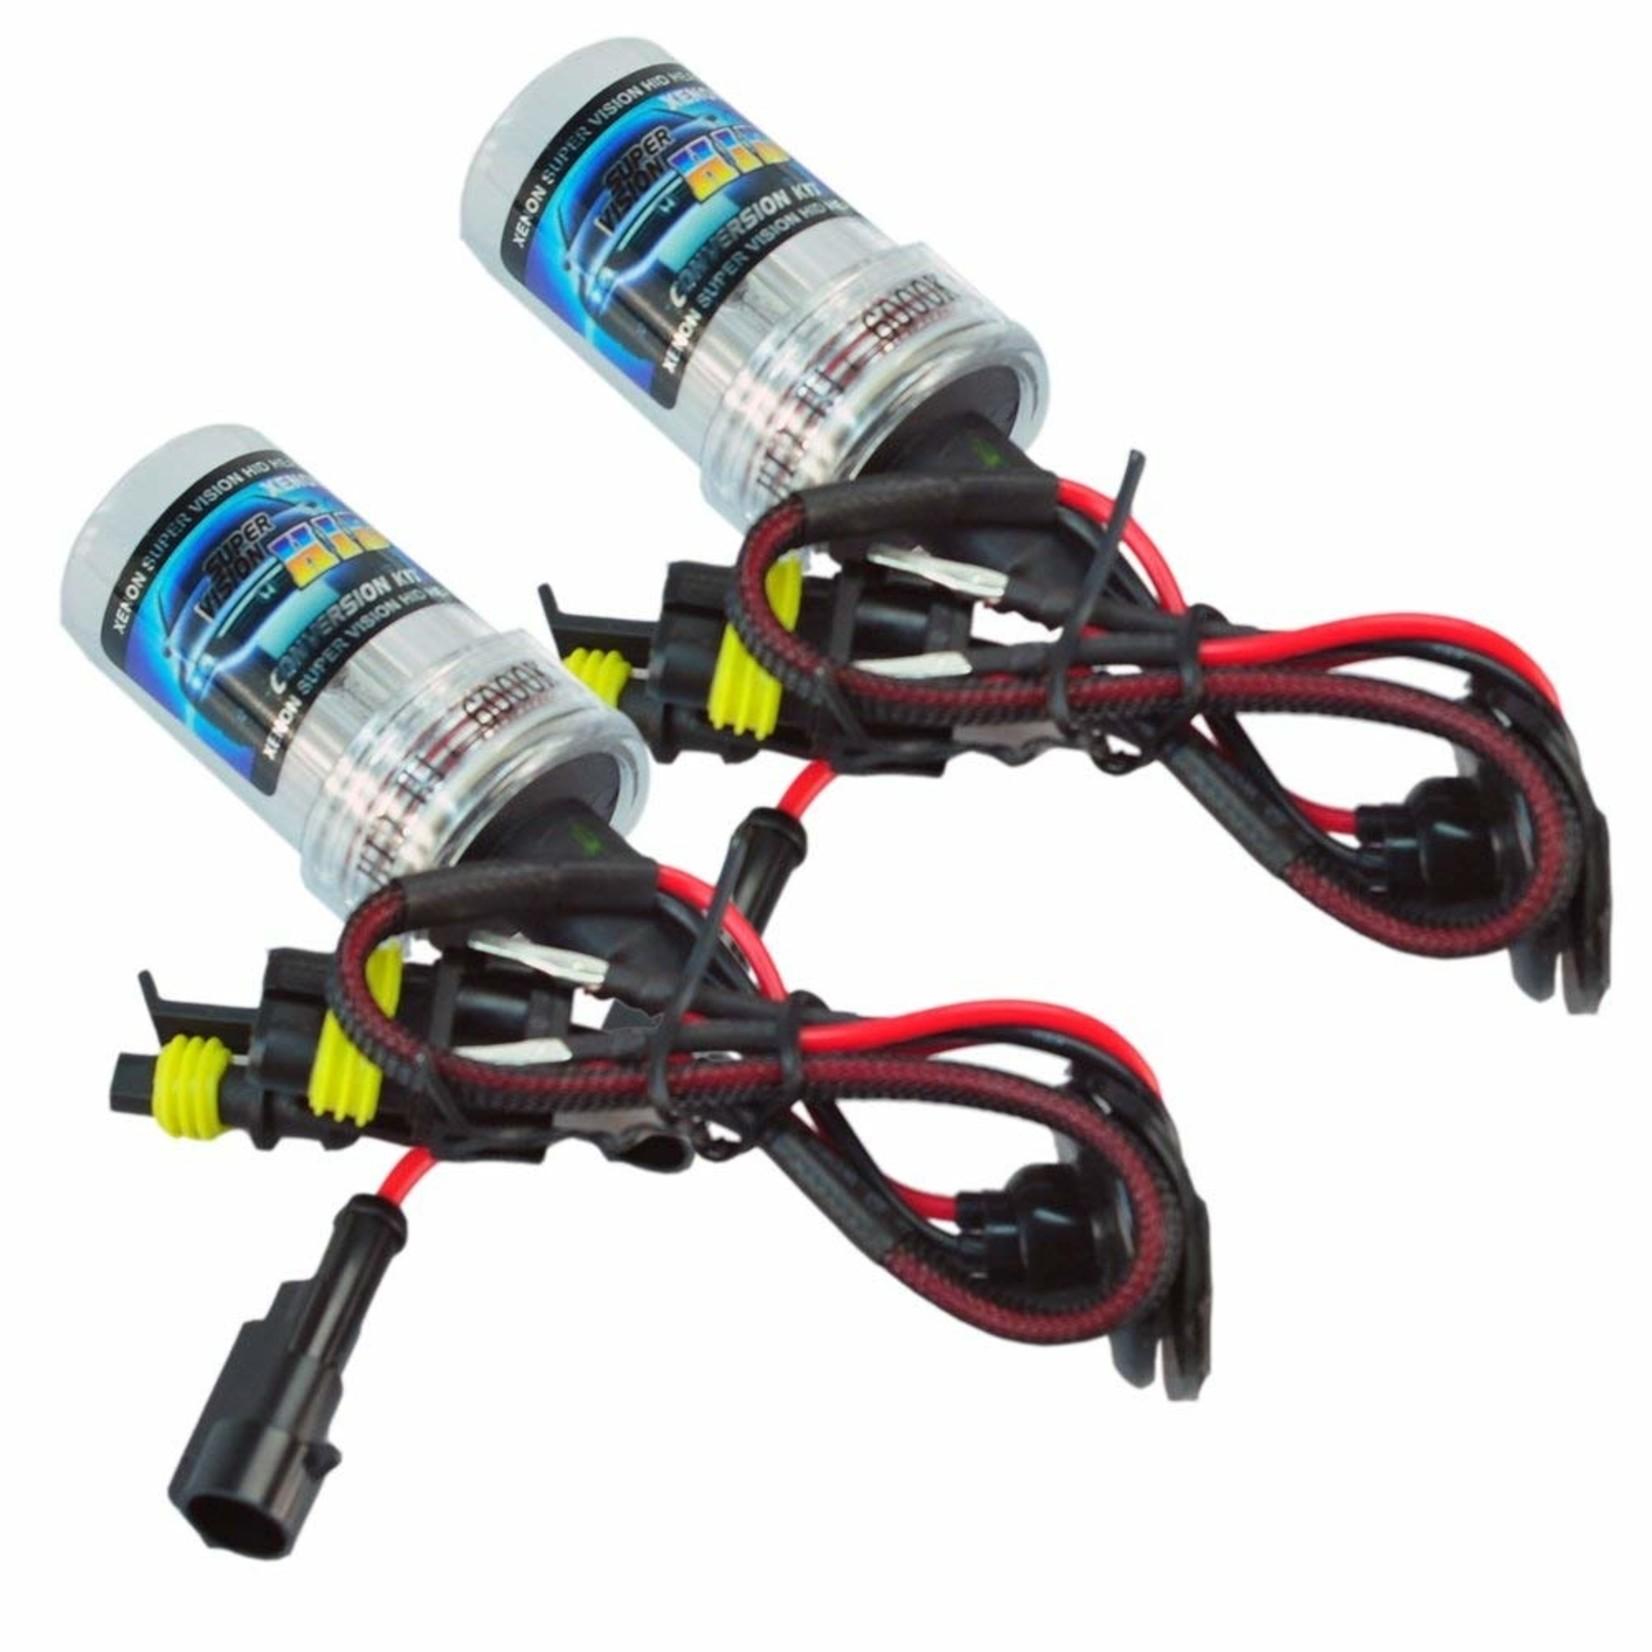 XEOD H11 Xenon vervangingslamp